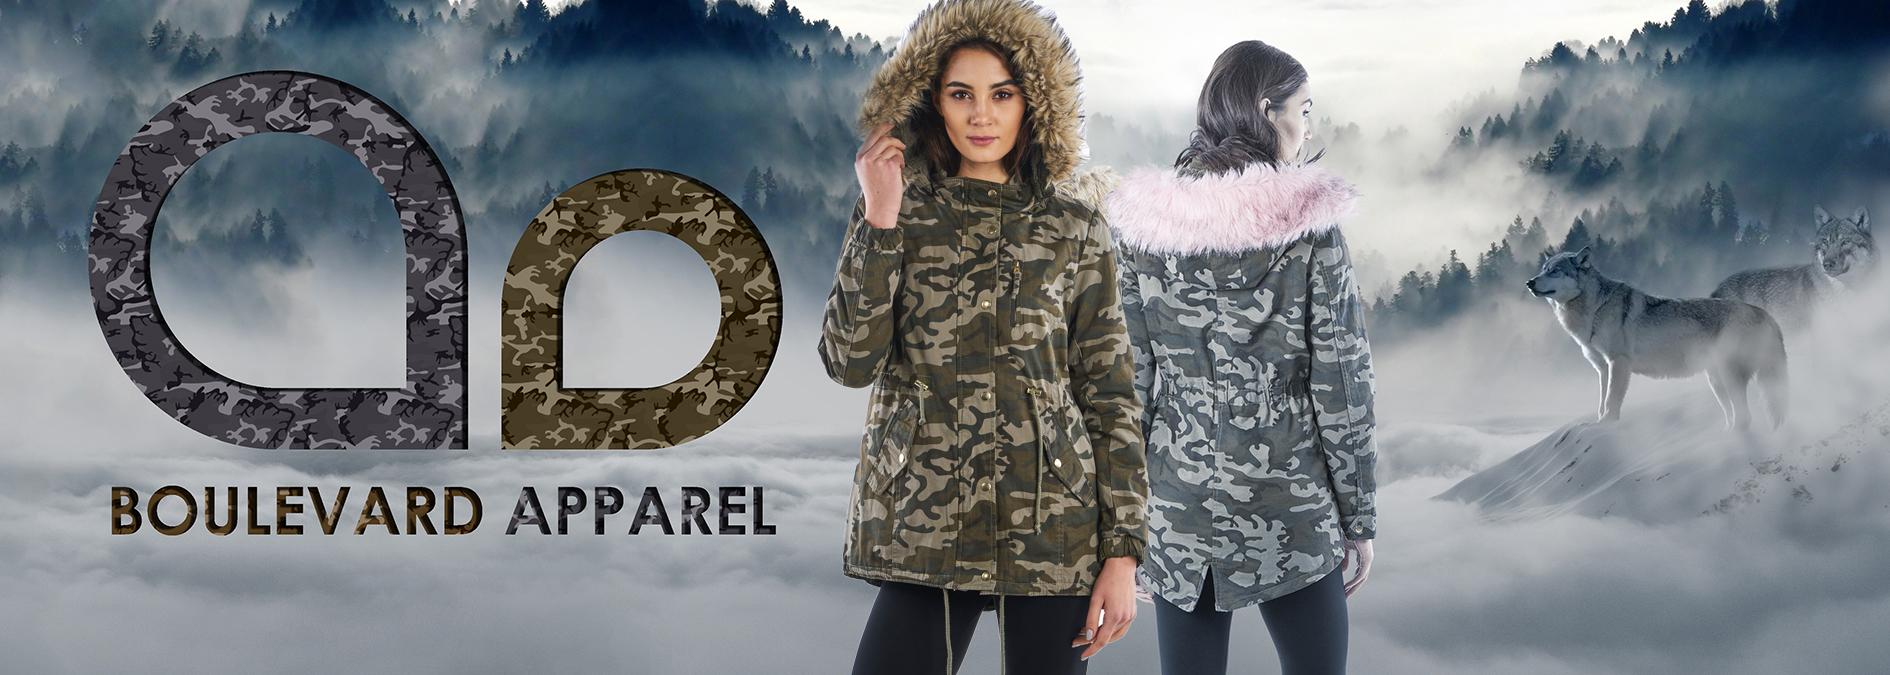 Wholesale Clothing Distributor - Dresses, Denims, Hoodies